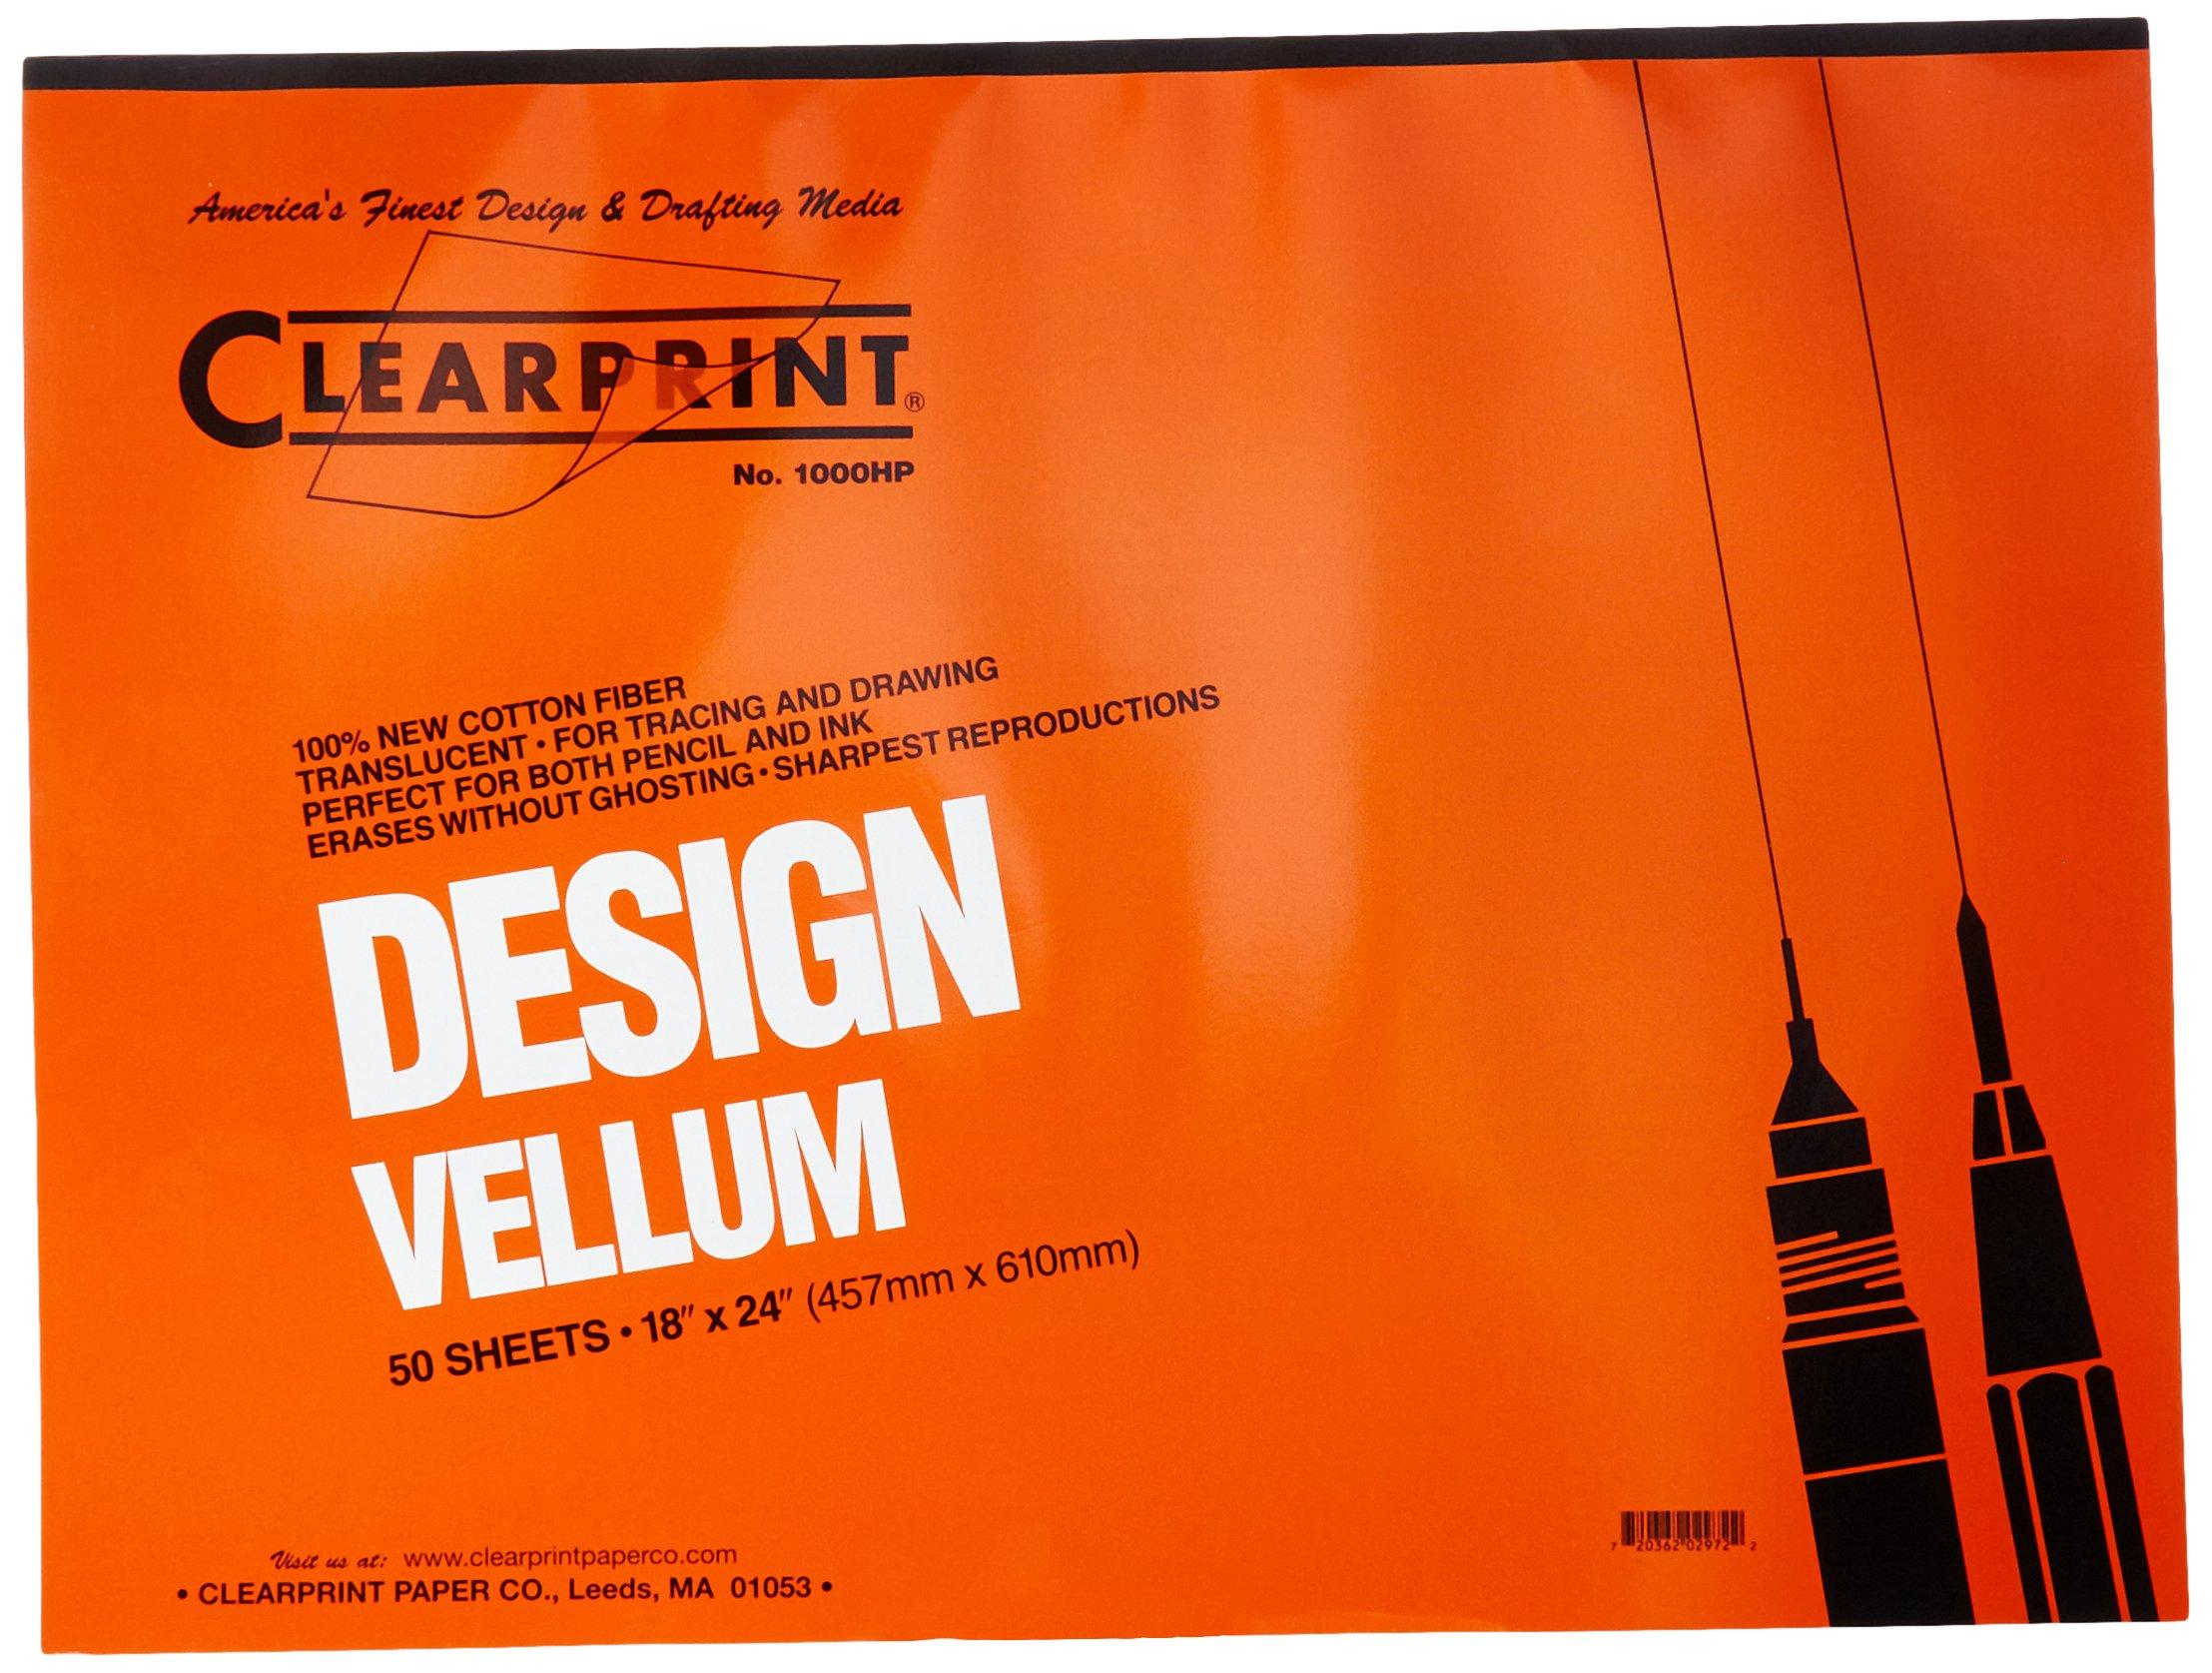 Clearprint 1000H Design Vellum Pad, 16 lb, 100% Cotton, 18 x 24 Inches, 50 Sheets, Translucent White, 1 Each (10001422)